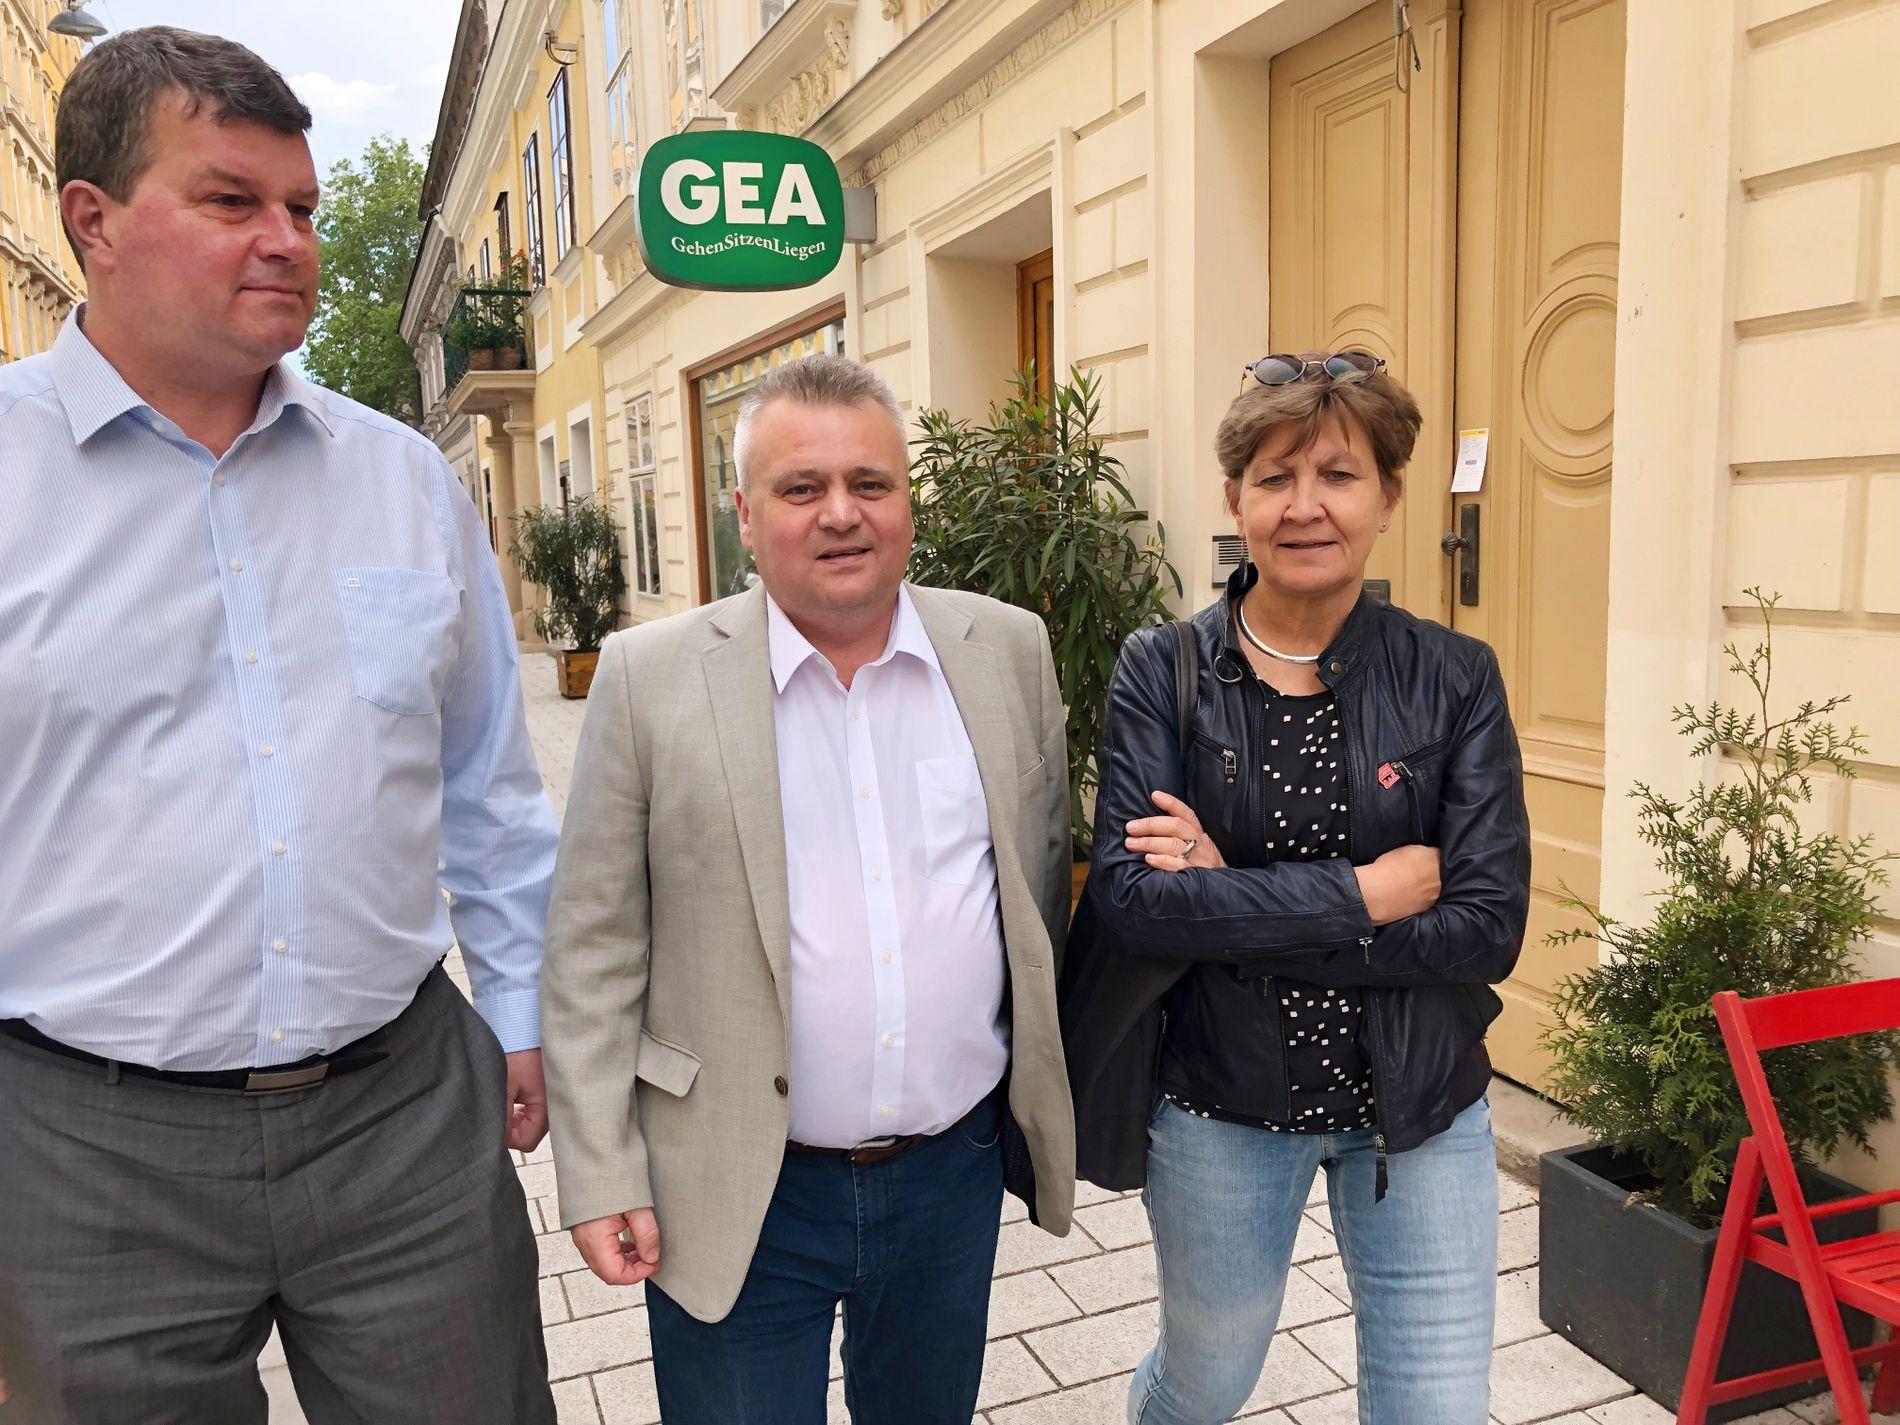 KLAR MELDING FRA WIEN: LO-leder Hans-Christian Gabrielsen (f.v.), Fellesforbund-leder Jørn Eggum og Fagforbund-leder Mette Nord er i Wien på kongress.